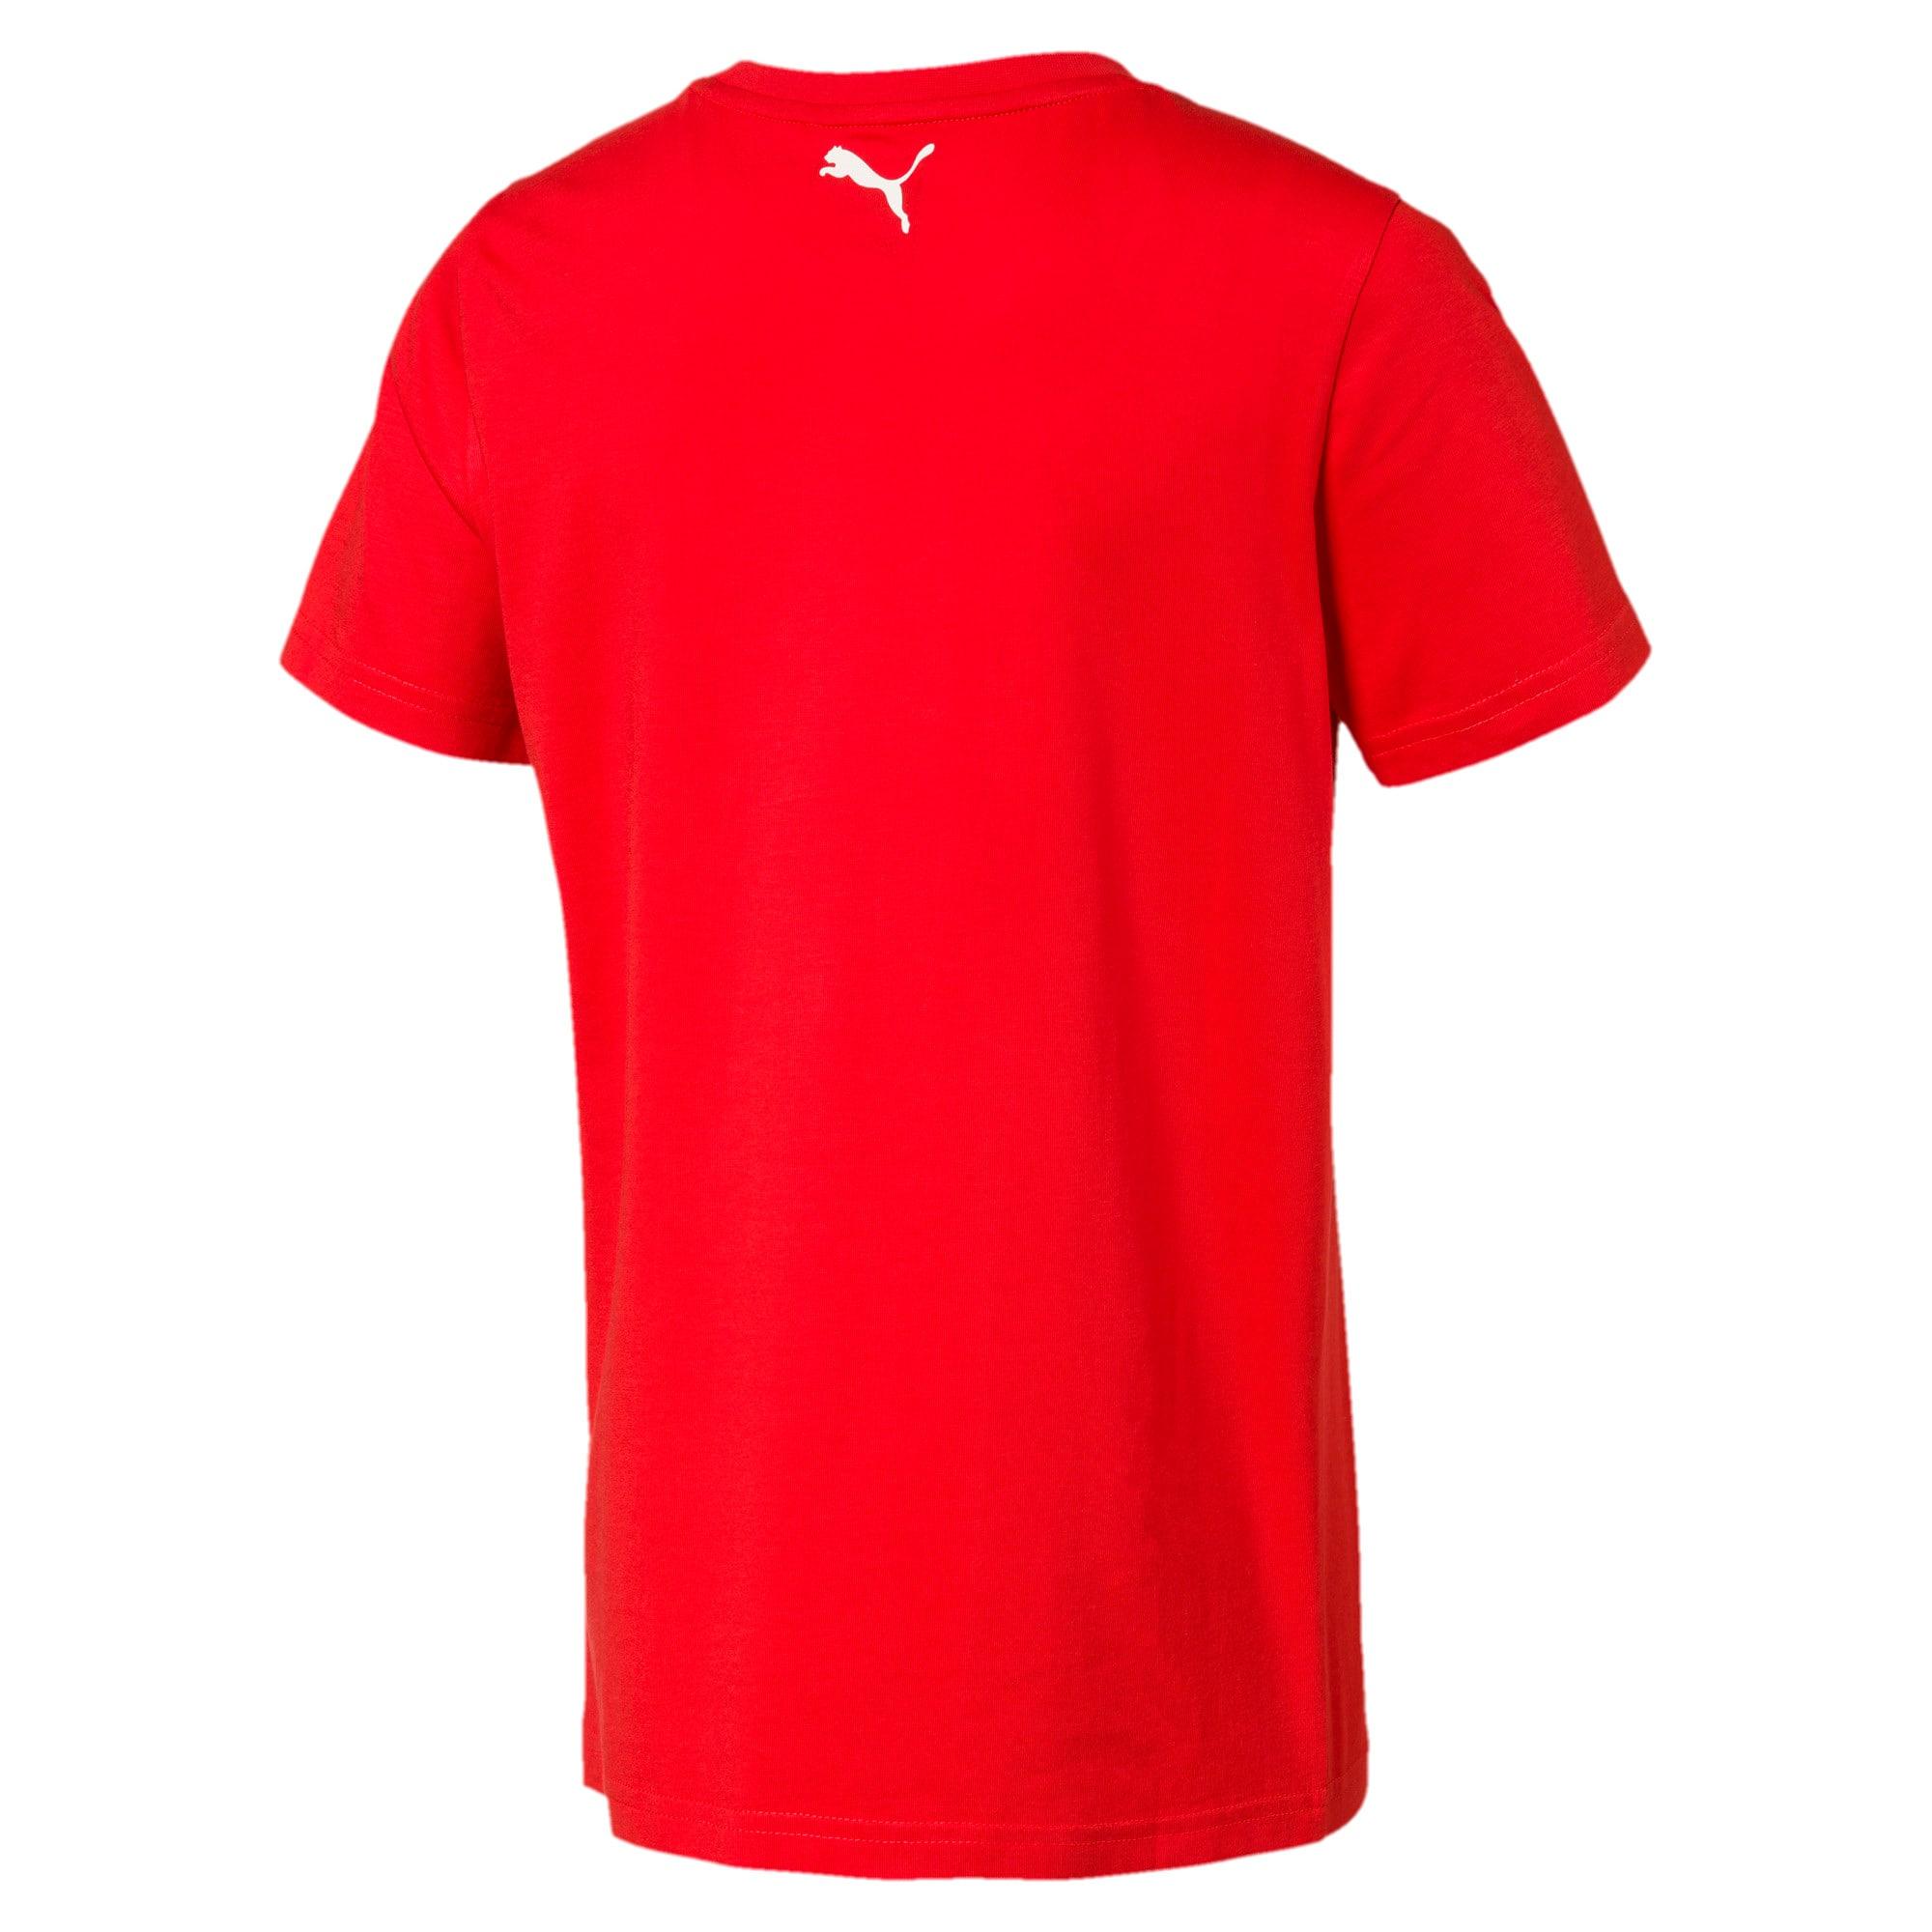 Thumbnail 2 of キッズ ALPHA SS グラフィック Tシャツ 半袖, High Risk Red, medium-JPN